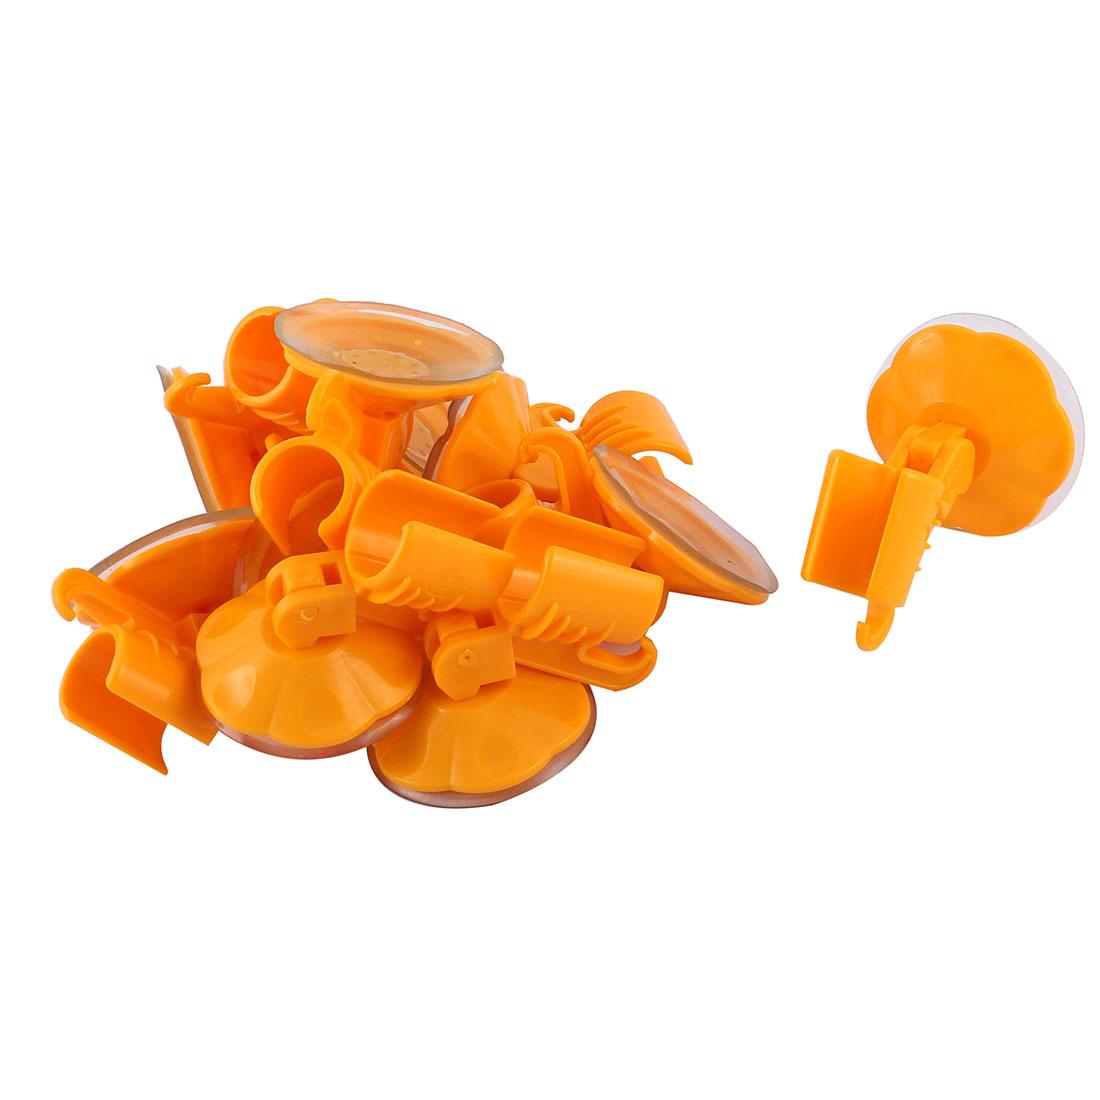 10pcs Attachable Bathroom Shower Head Holder Wall Suction Cup Bracket Orange